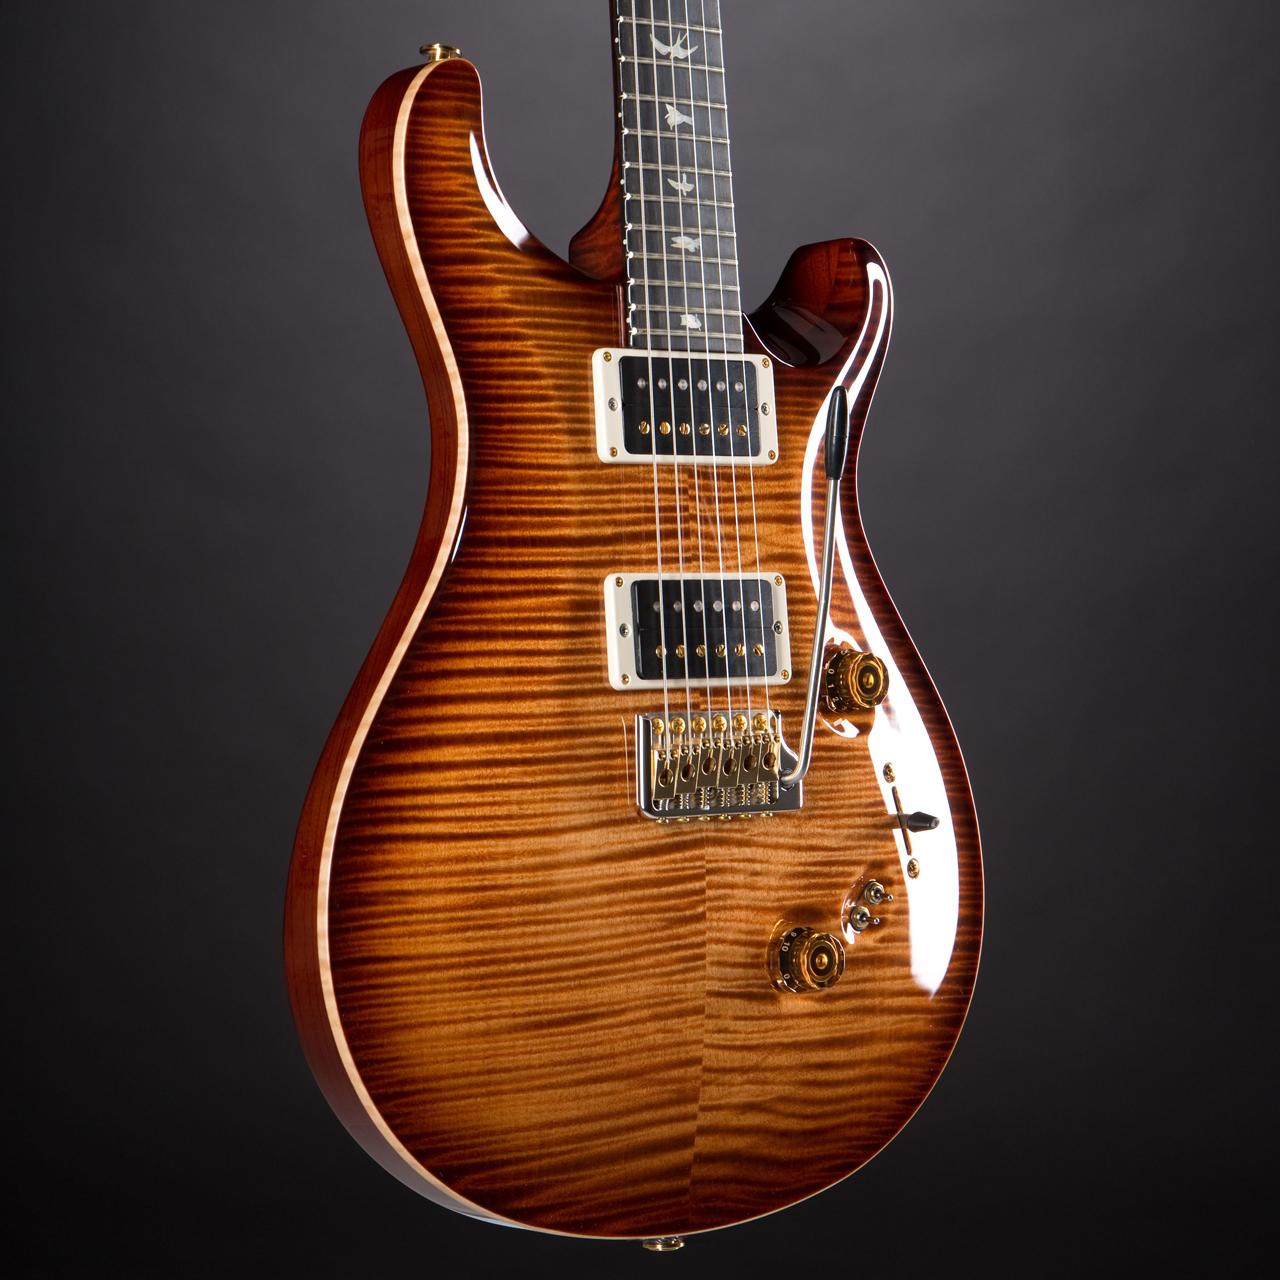 Wunderbar Prs Custom 24 Gitarren Pickups Schaltplan Bilder ...